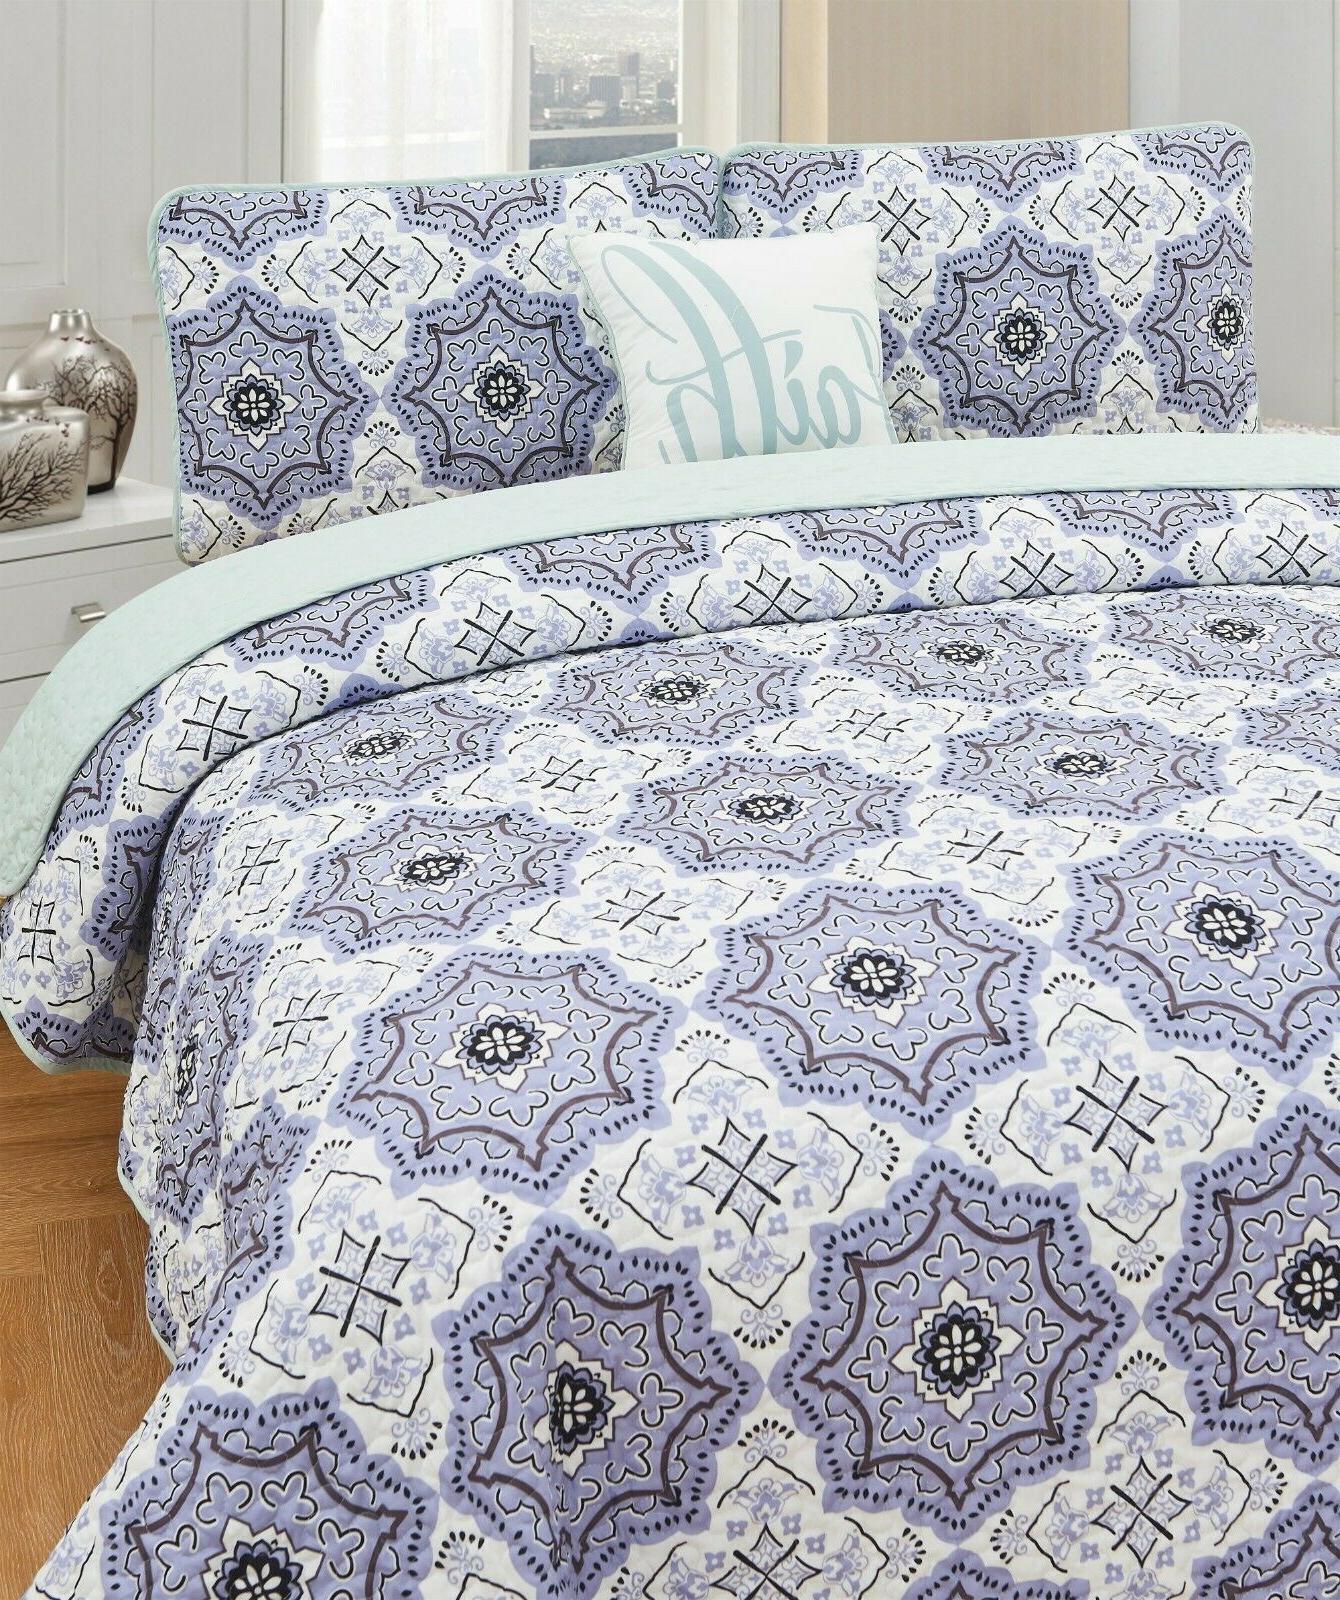 Queen Printed Pattern Quilt Set King Bedding Set